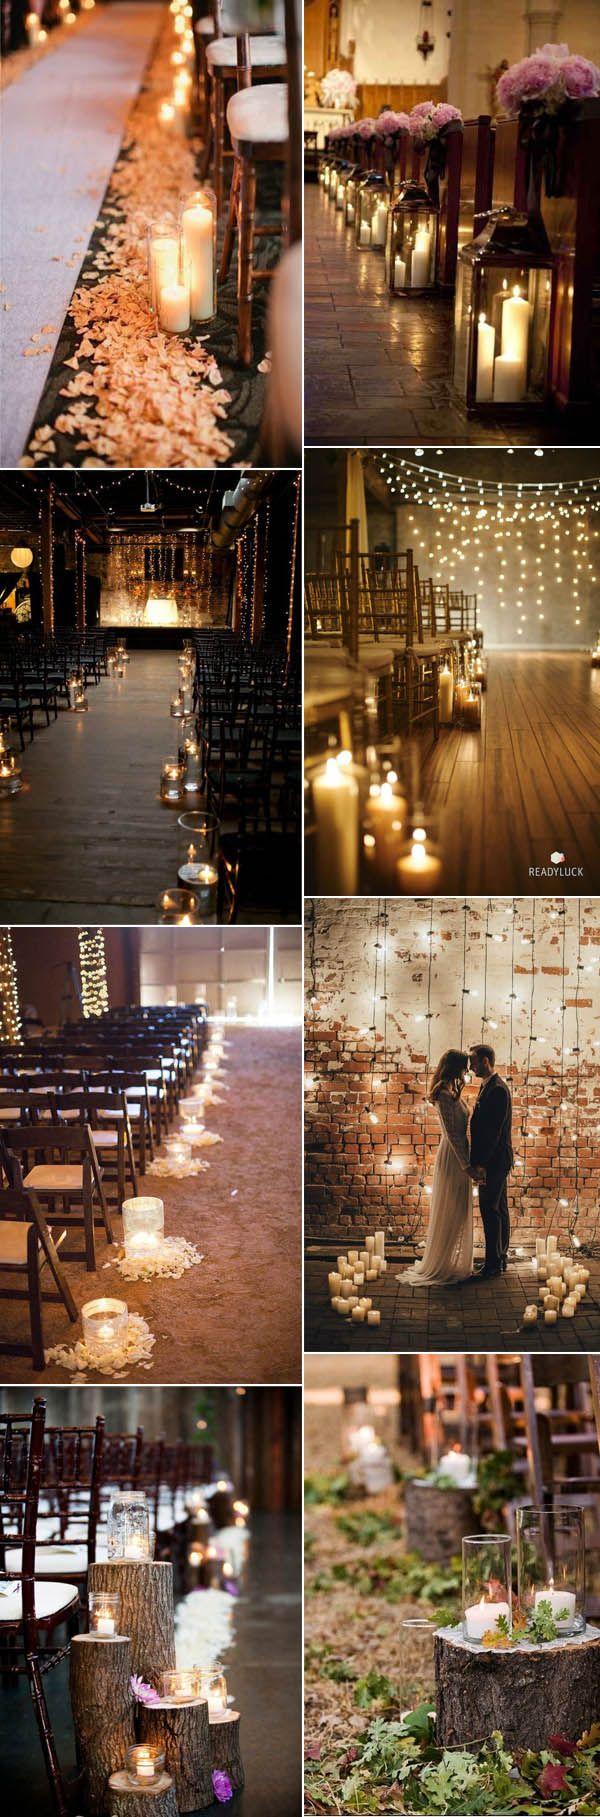 Wedding venue decorations ideas november 2018  best Pietarila wedding images on Pinterest  Wedding ideas